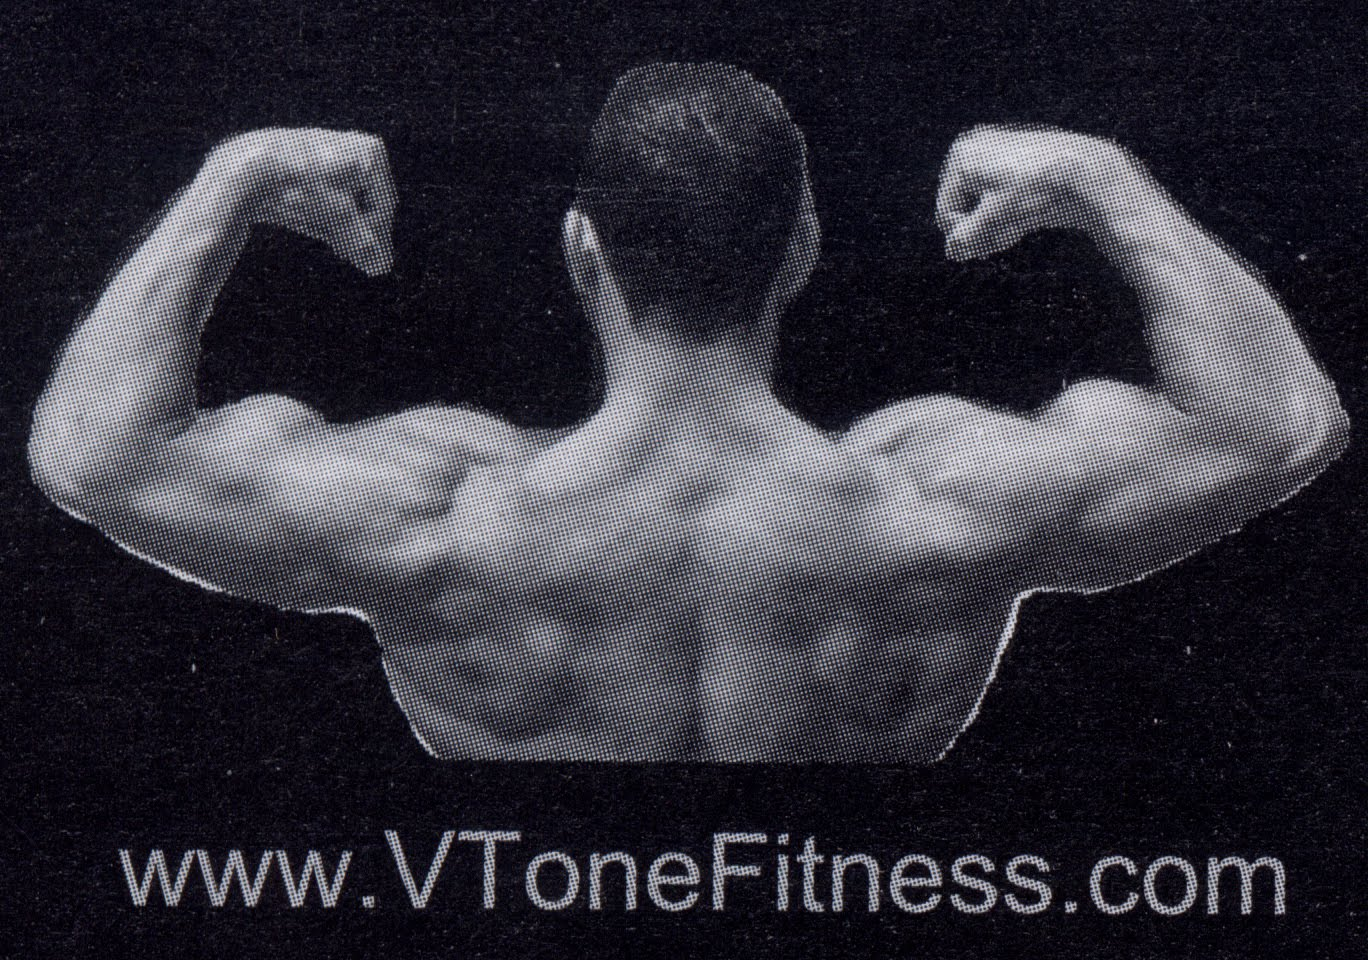 V-Tone Fitness